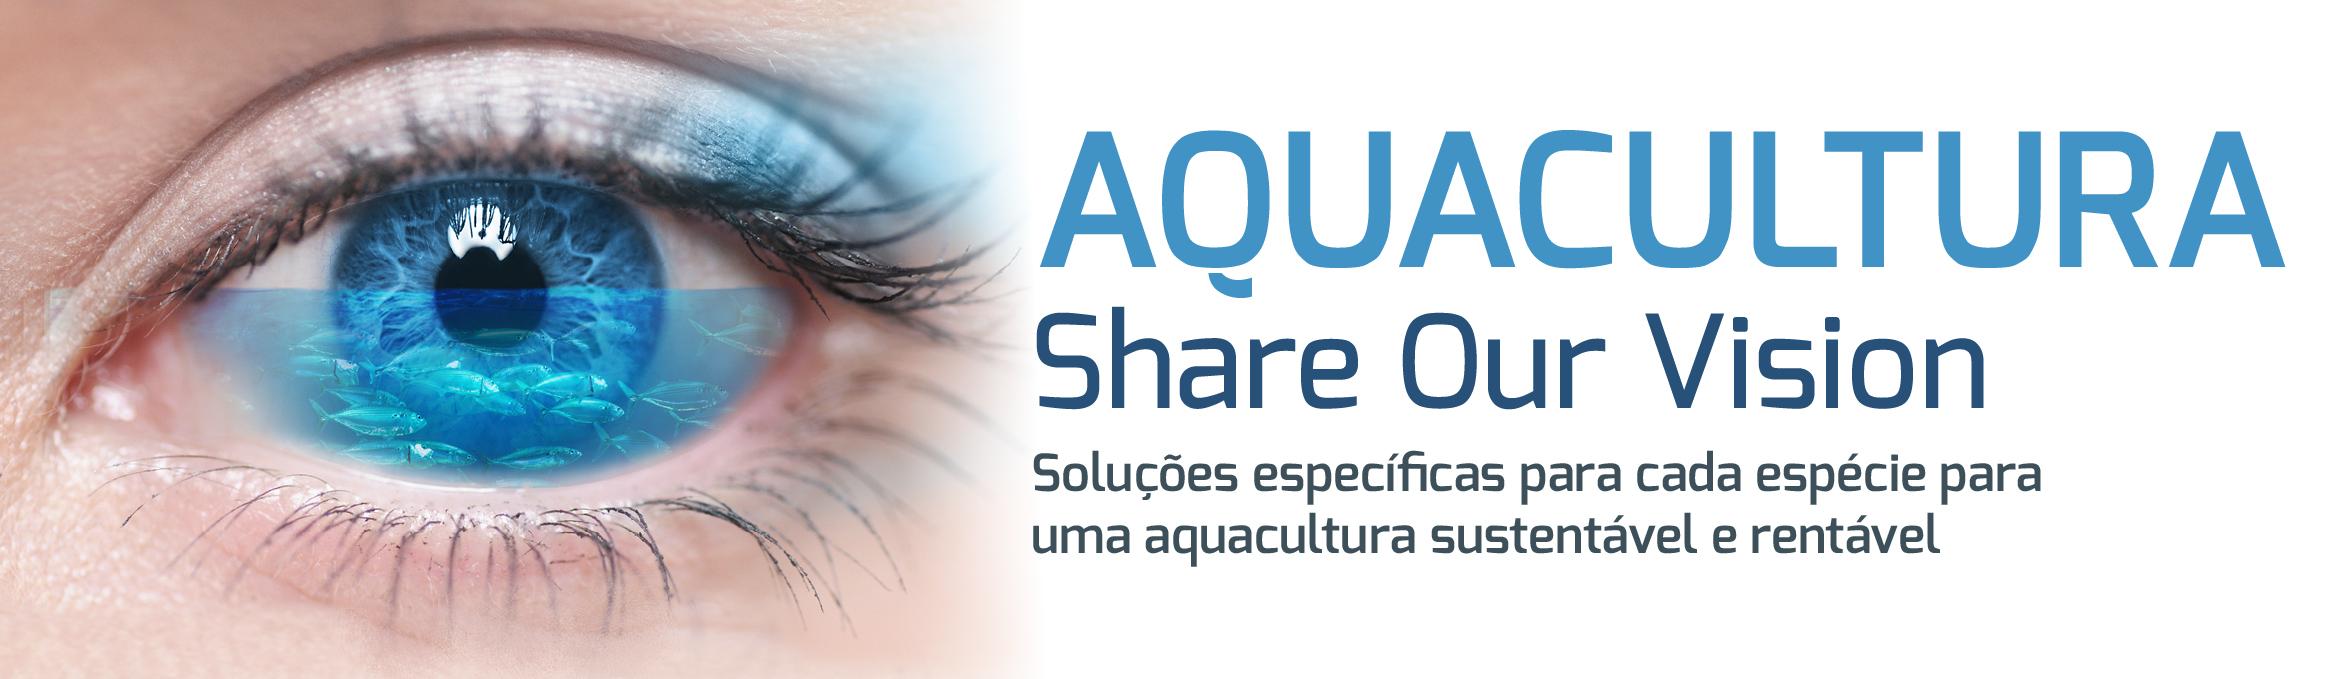 Aquacultura, Adisseo